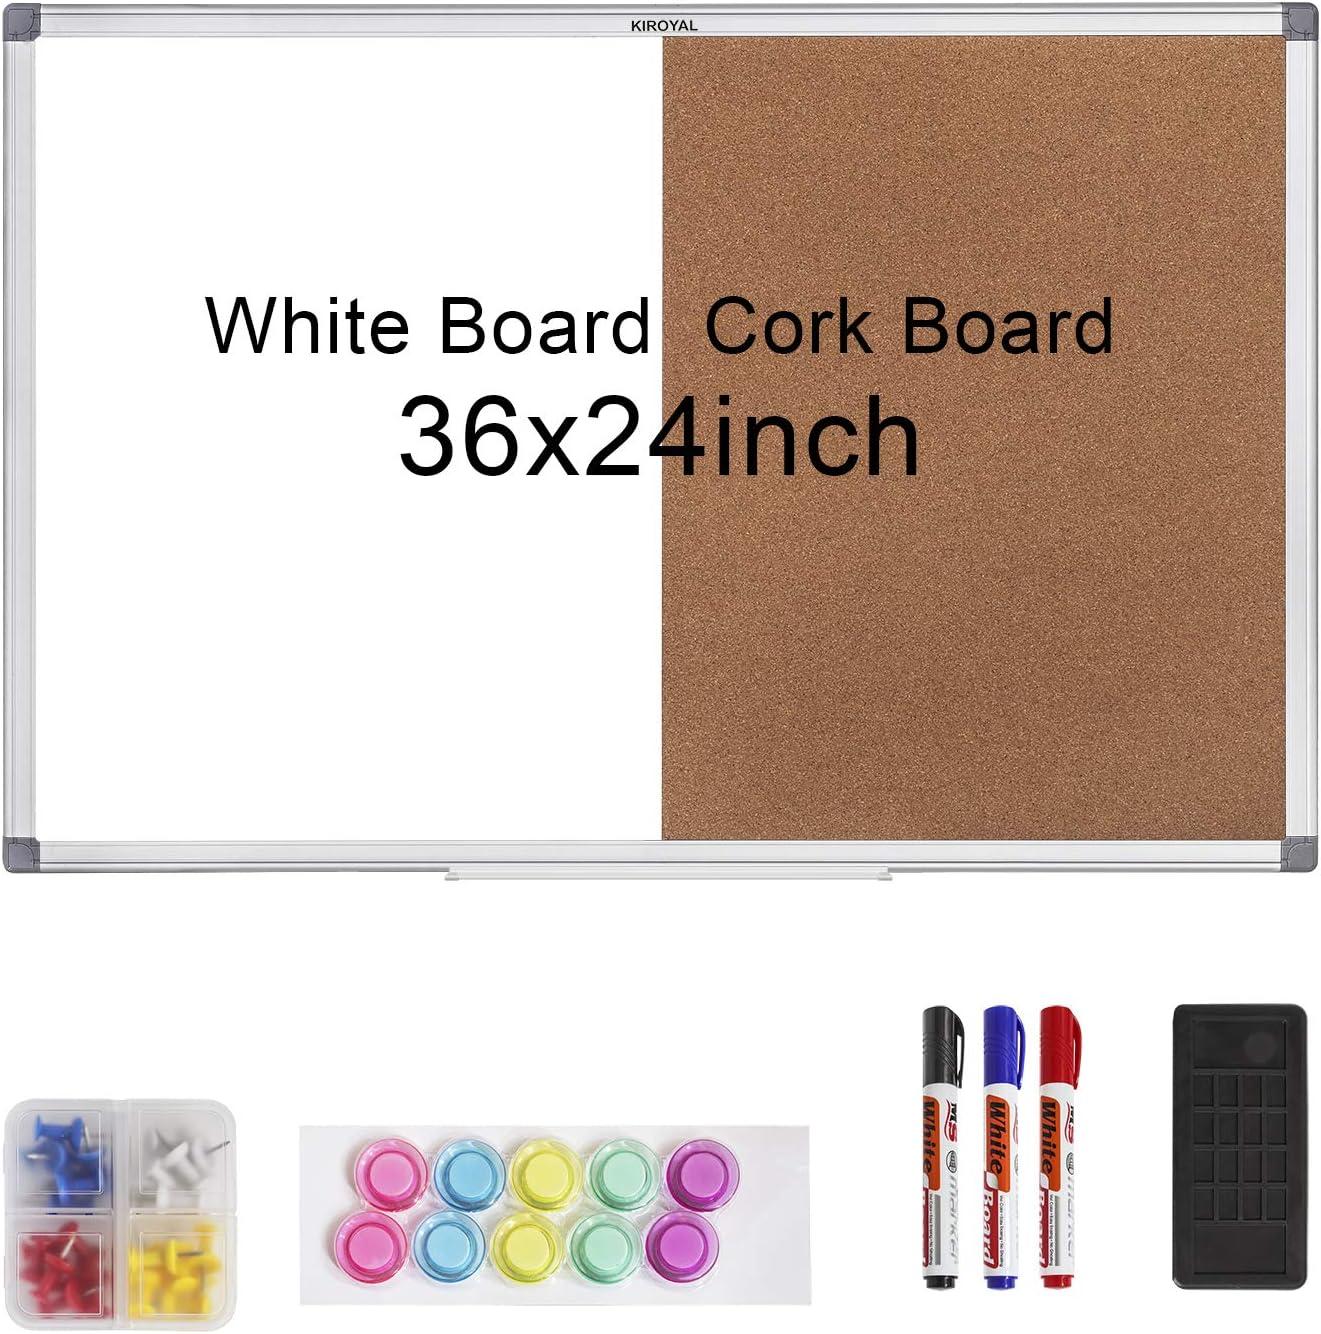 KIROYAL Cork Board 36 x 24 Combo White Board Magnetic Combination Whiteboard Bulletin Dry Erase Board & Corkboard for Homeschooling, Office, Classroom Hanging Message Board Wall Mounted